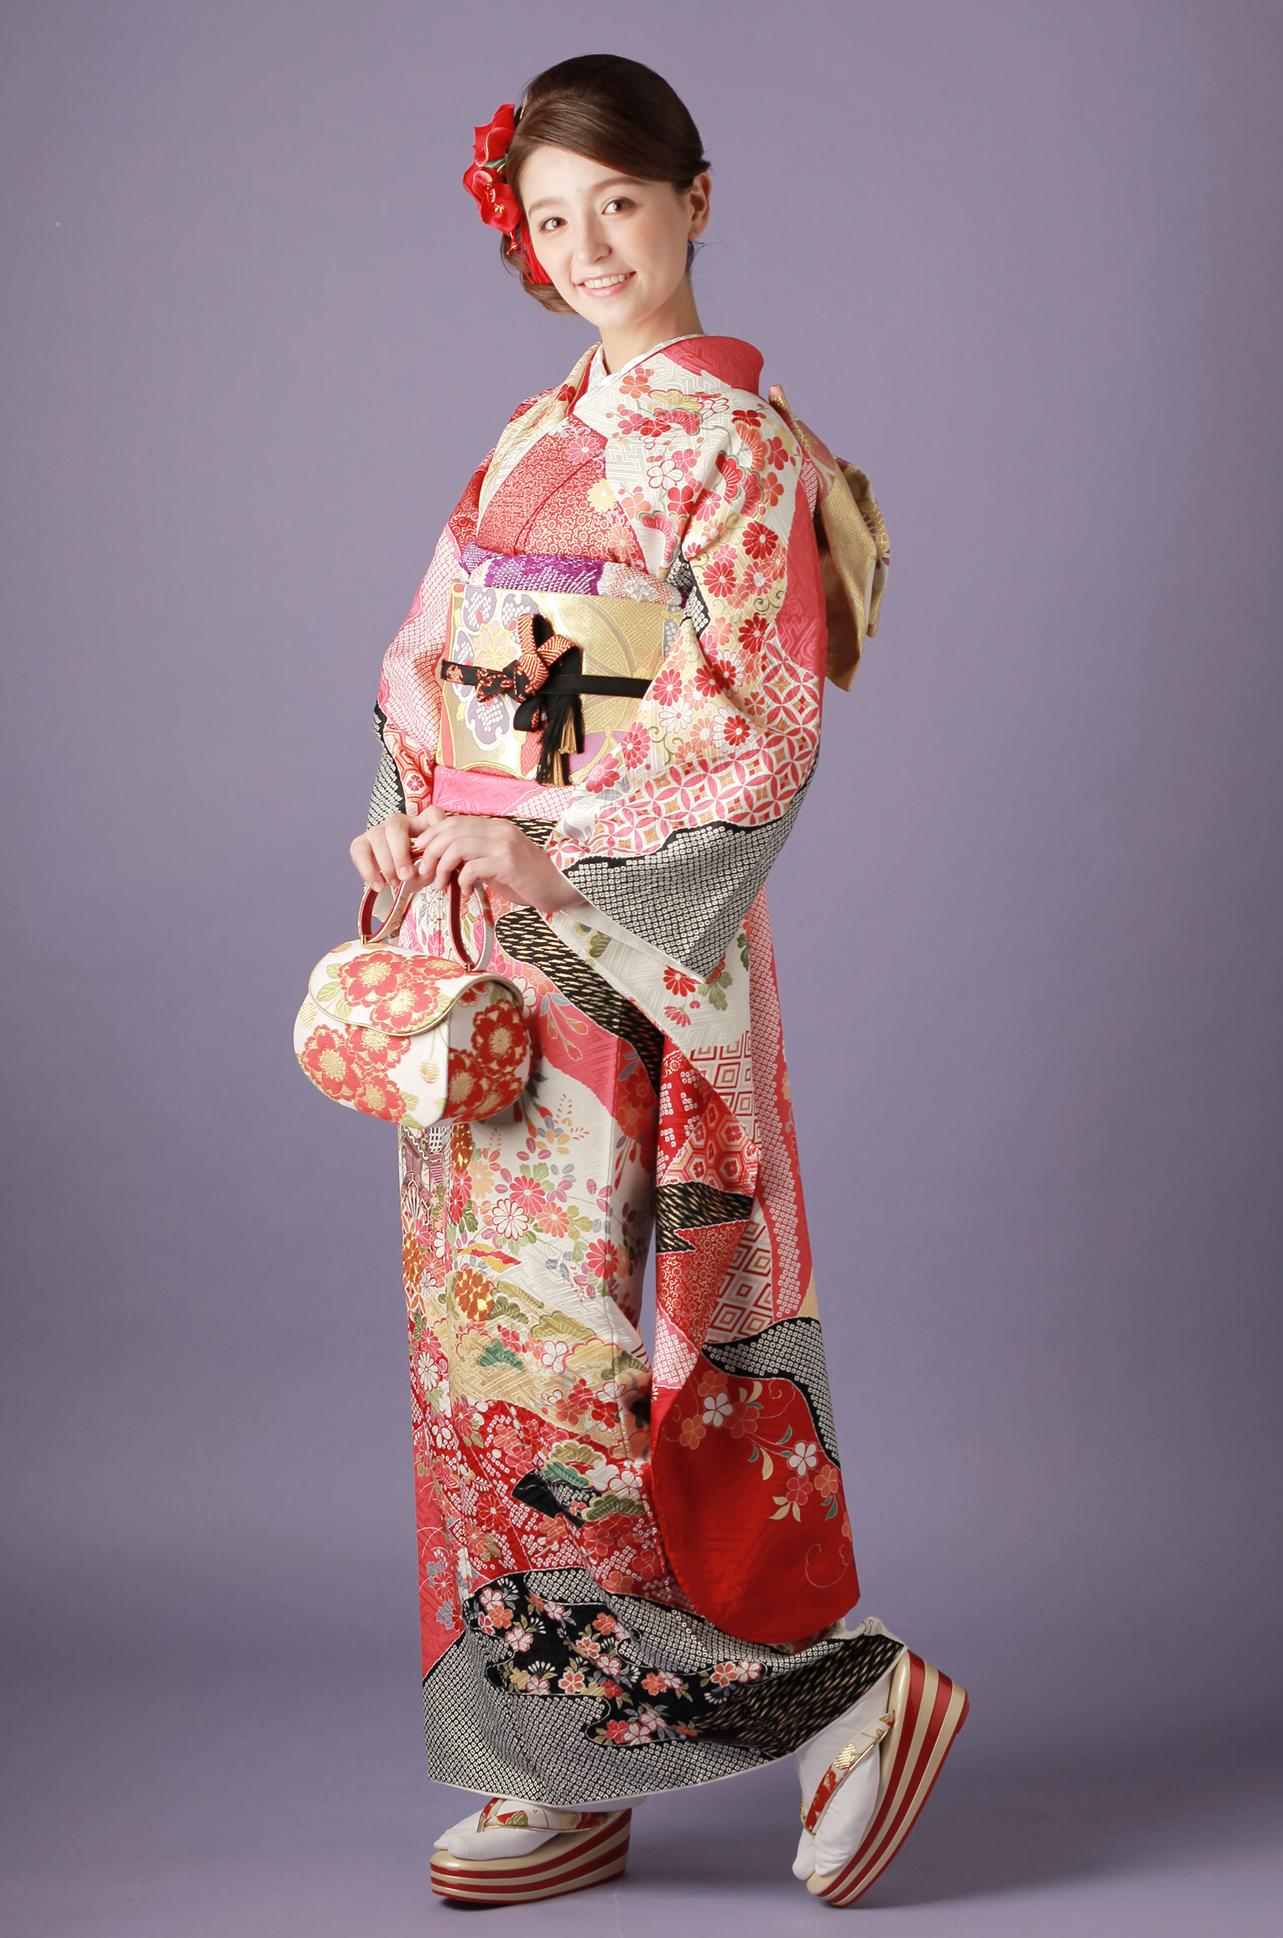 【MK-701】濃ピンク×赤地の花と御所車文様振袖